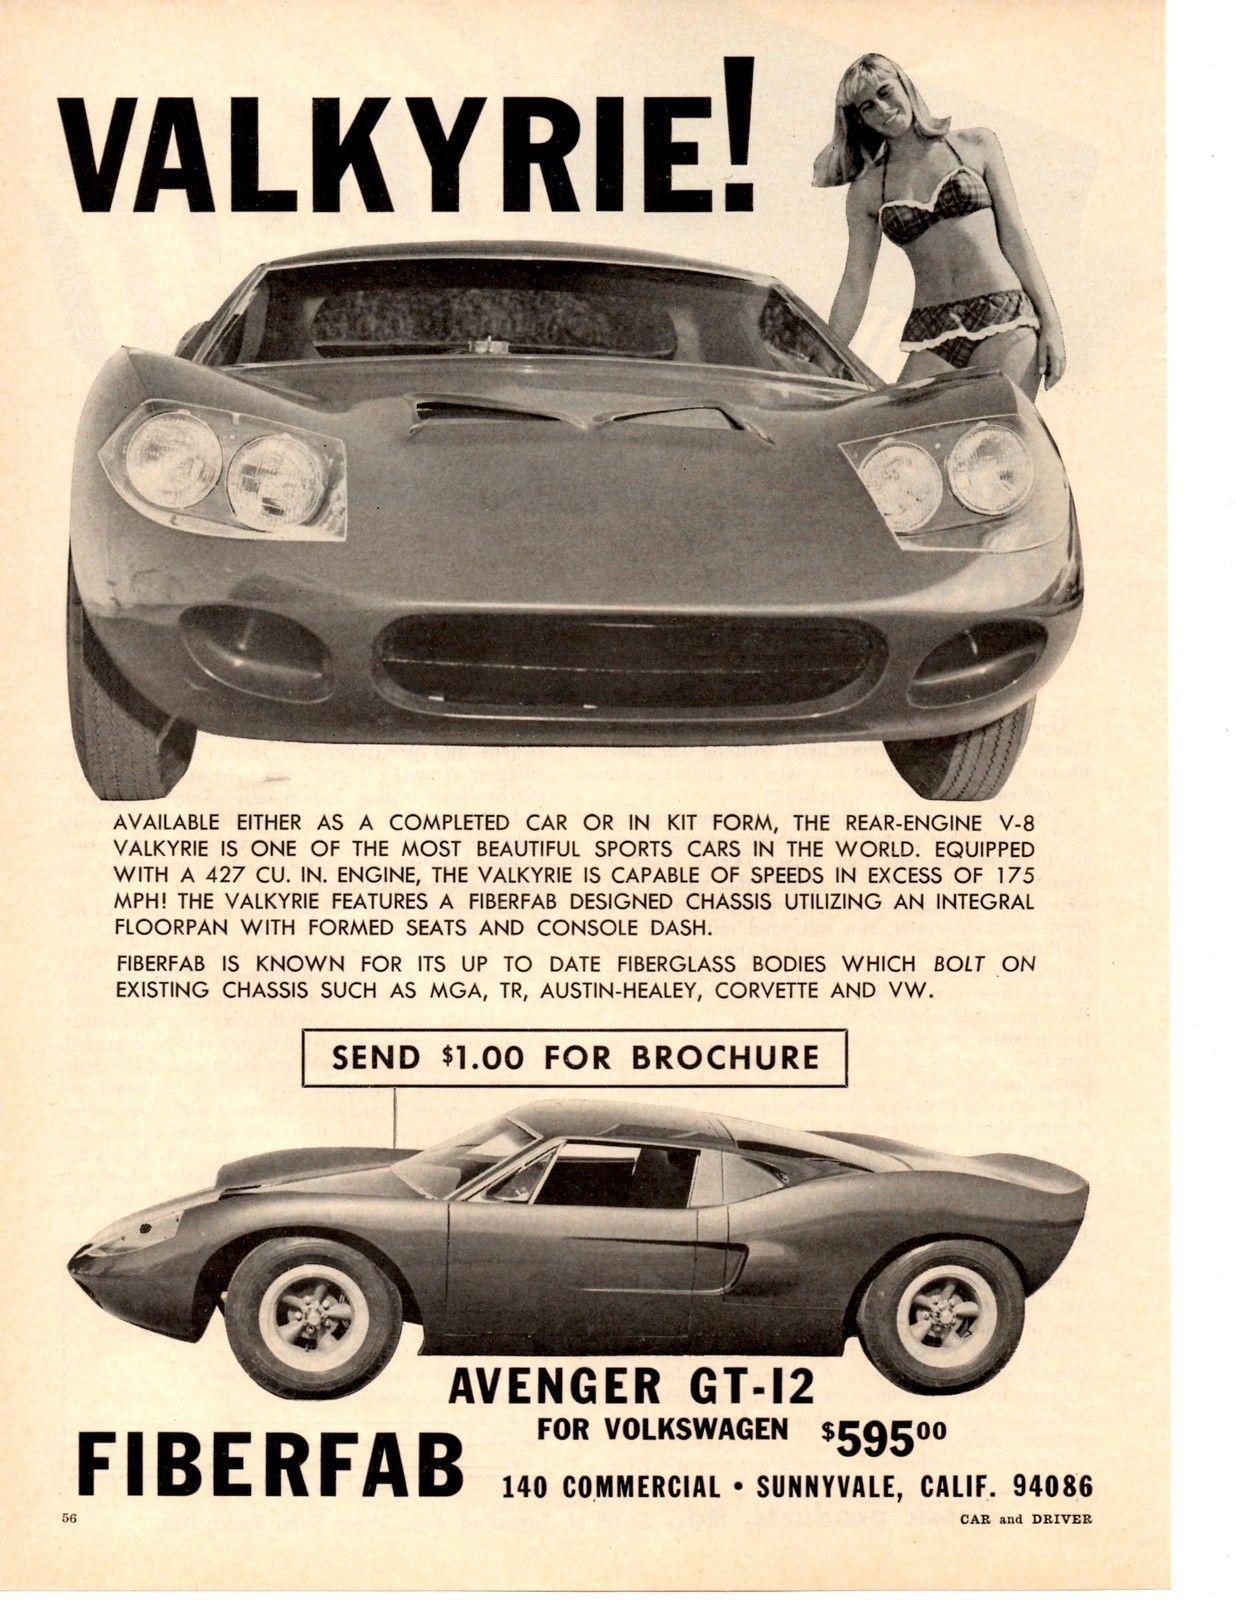 1966 Fiberfab Avenger GT 12 Kit Car Valkyrie 427 CU in RARE Print Ad ...